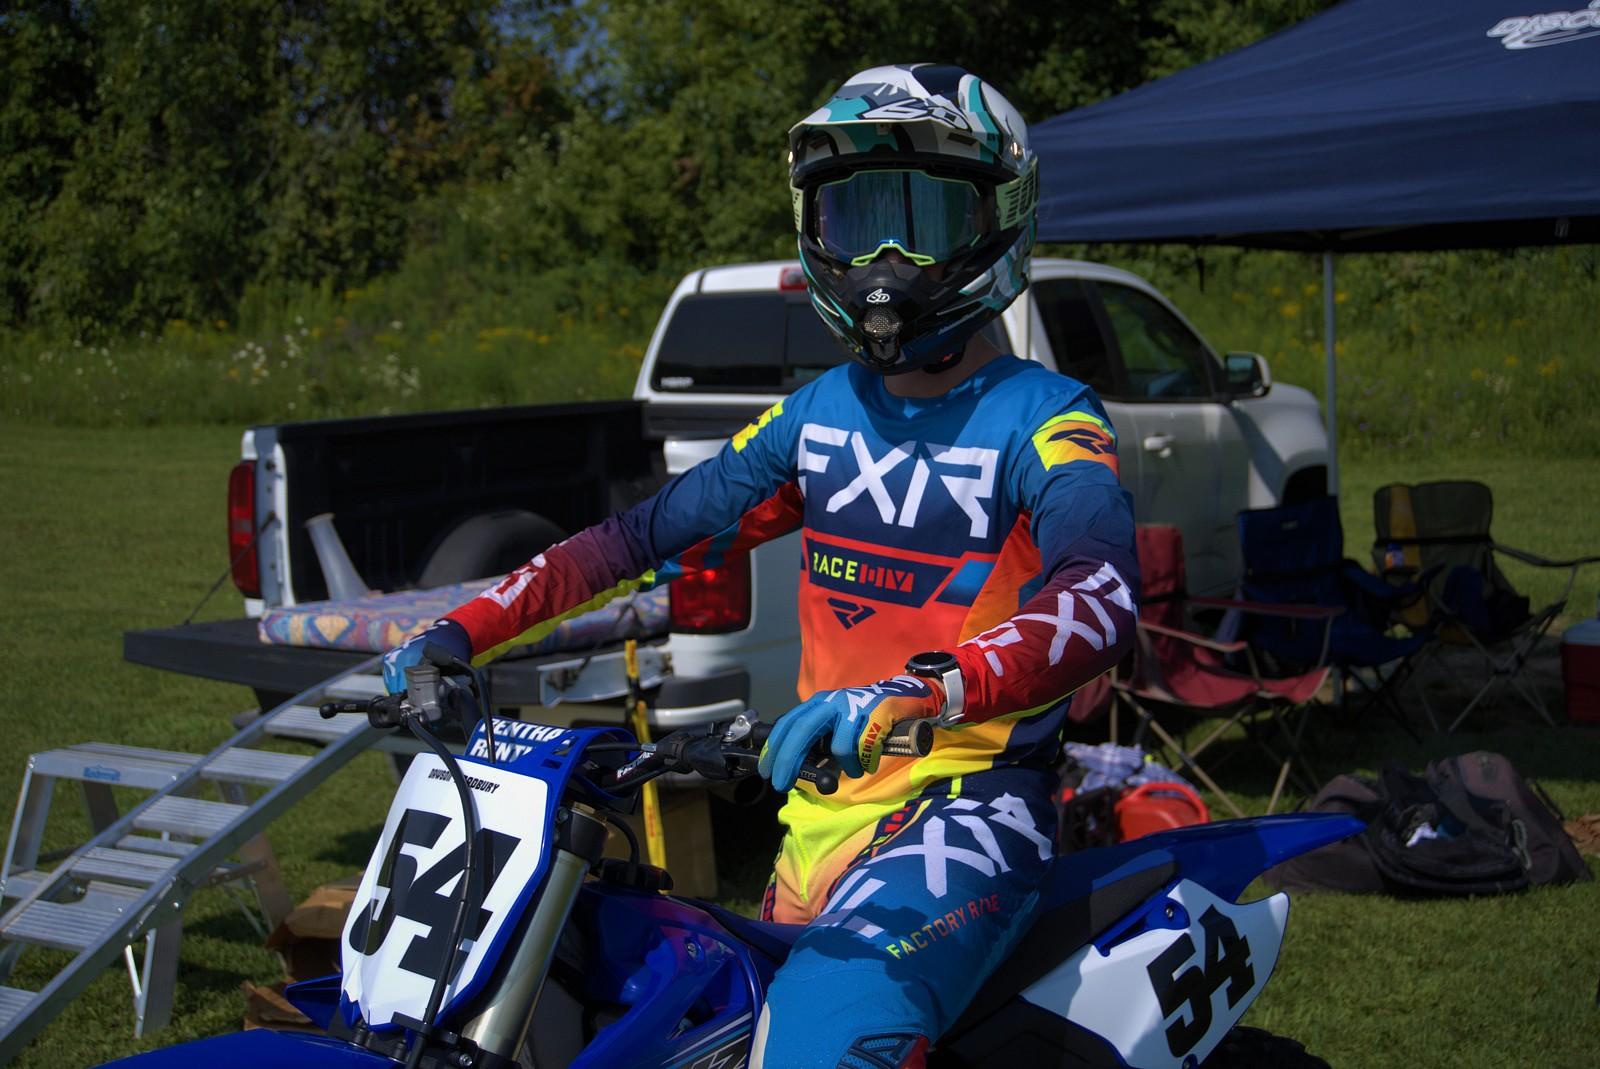 Photo 3 - DawsonBMX54 - Motocross Pictures - Vital MX